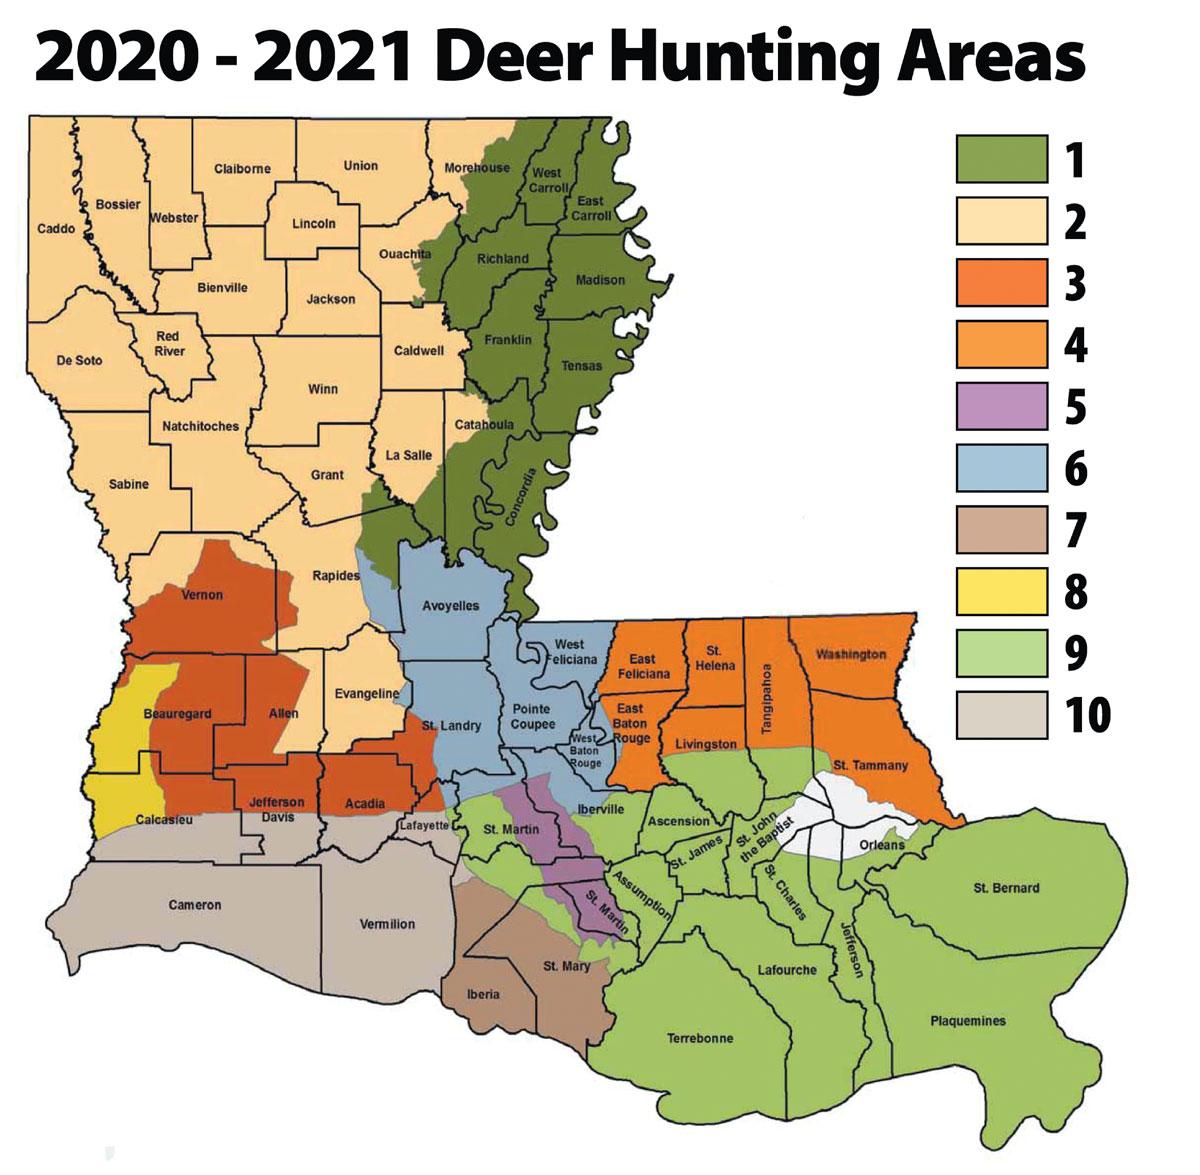 Louisiana'S 2020 Rut Report - Louisiana Sportsman for 2021 Deer Rut Predictions